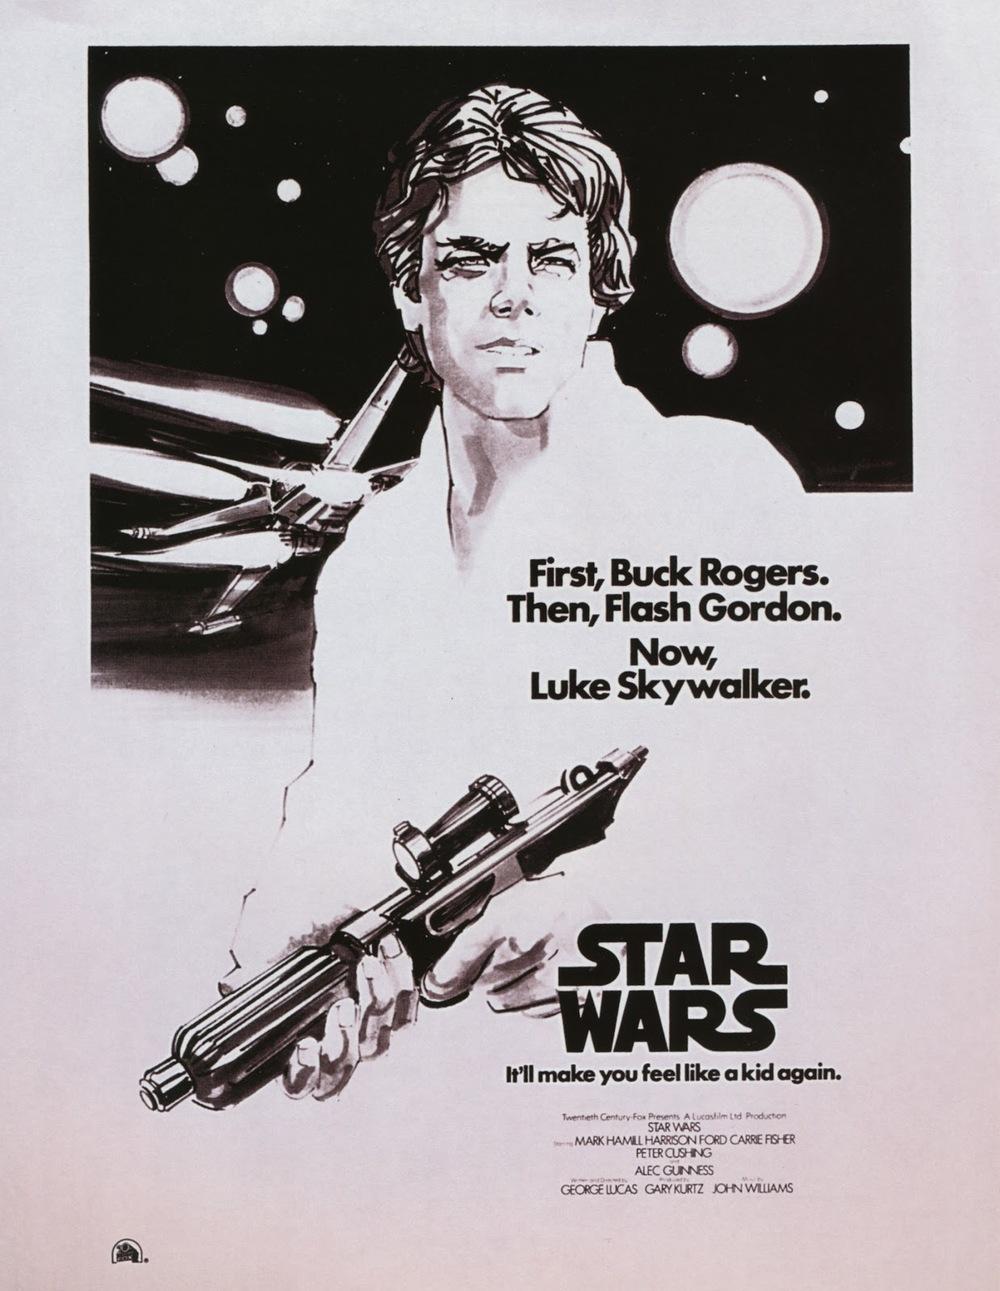 Star Wars - A New Hope (1977) Unused Concept.jpg